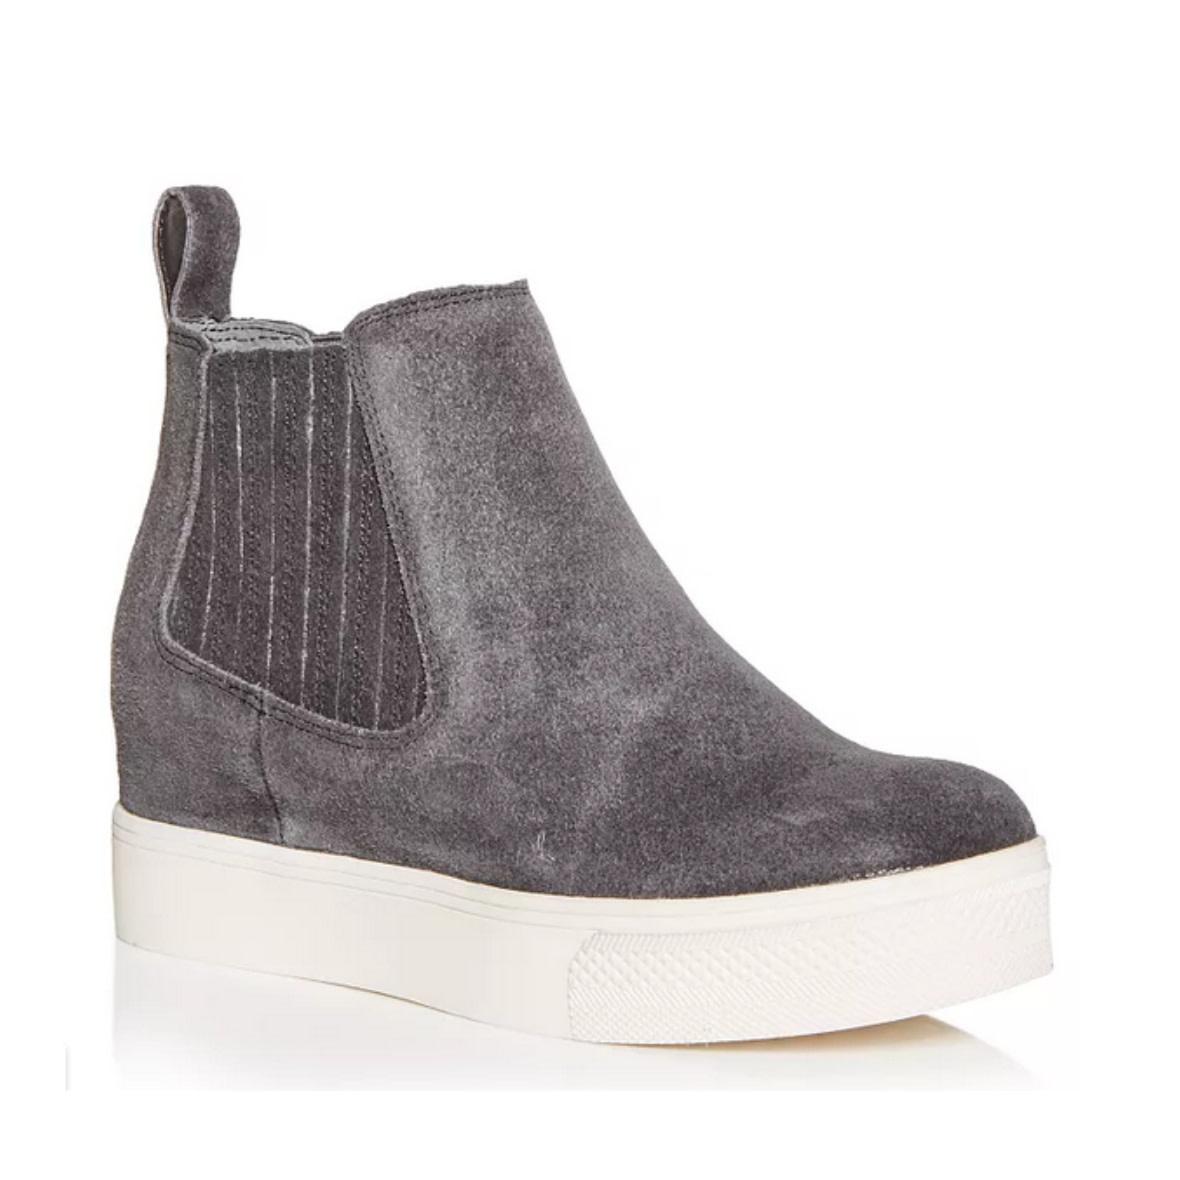 Dolce Vita Dolce Vita Wynd Sneaker